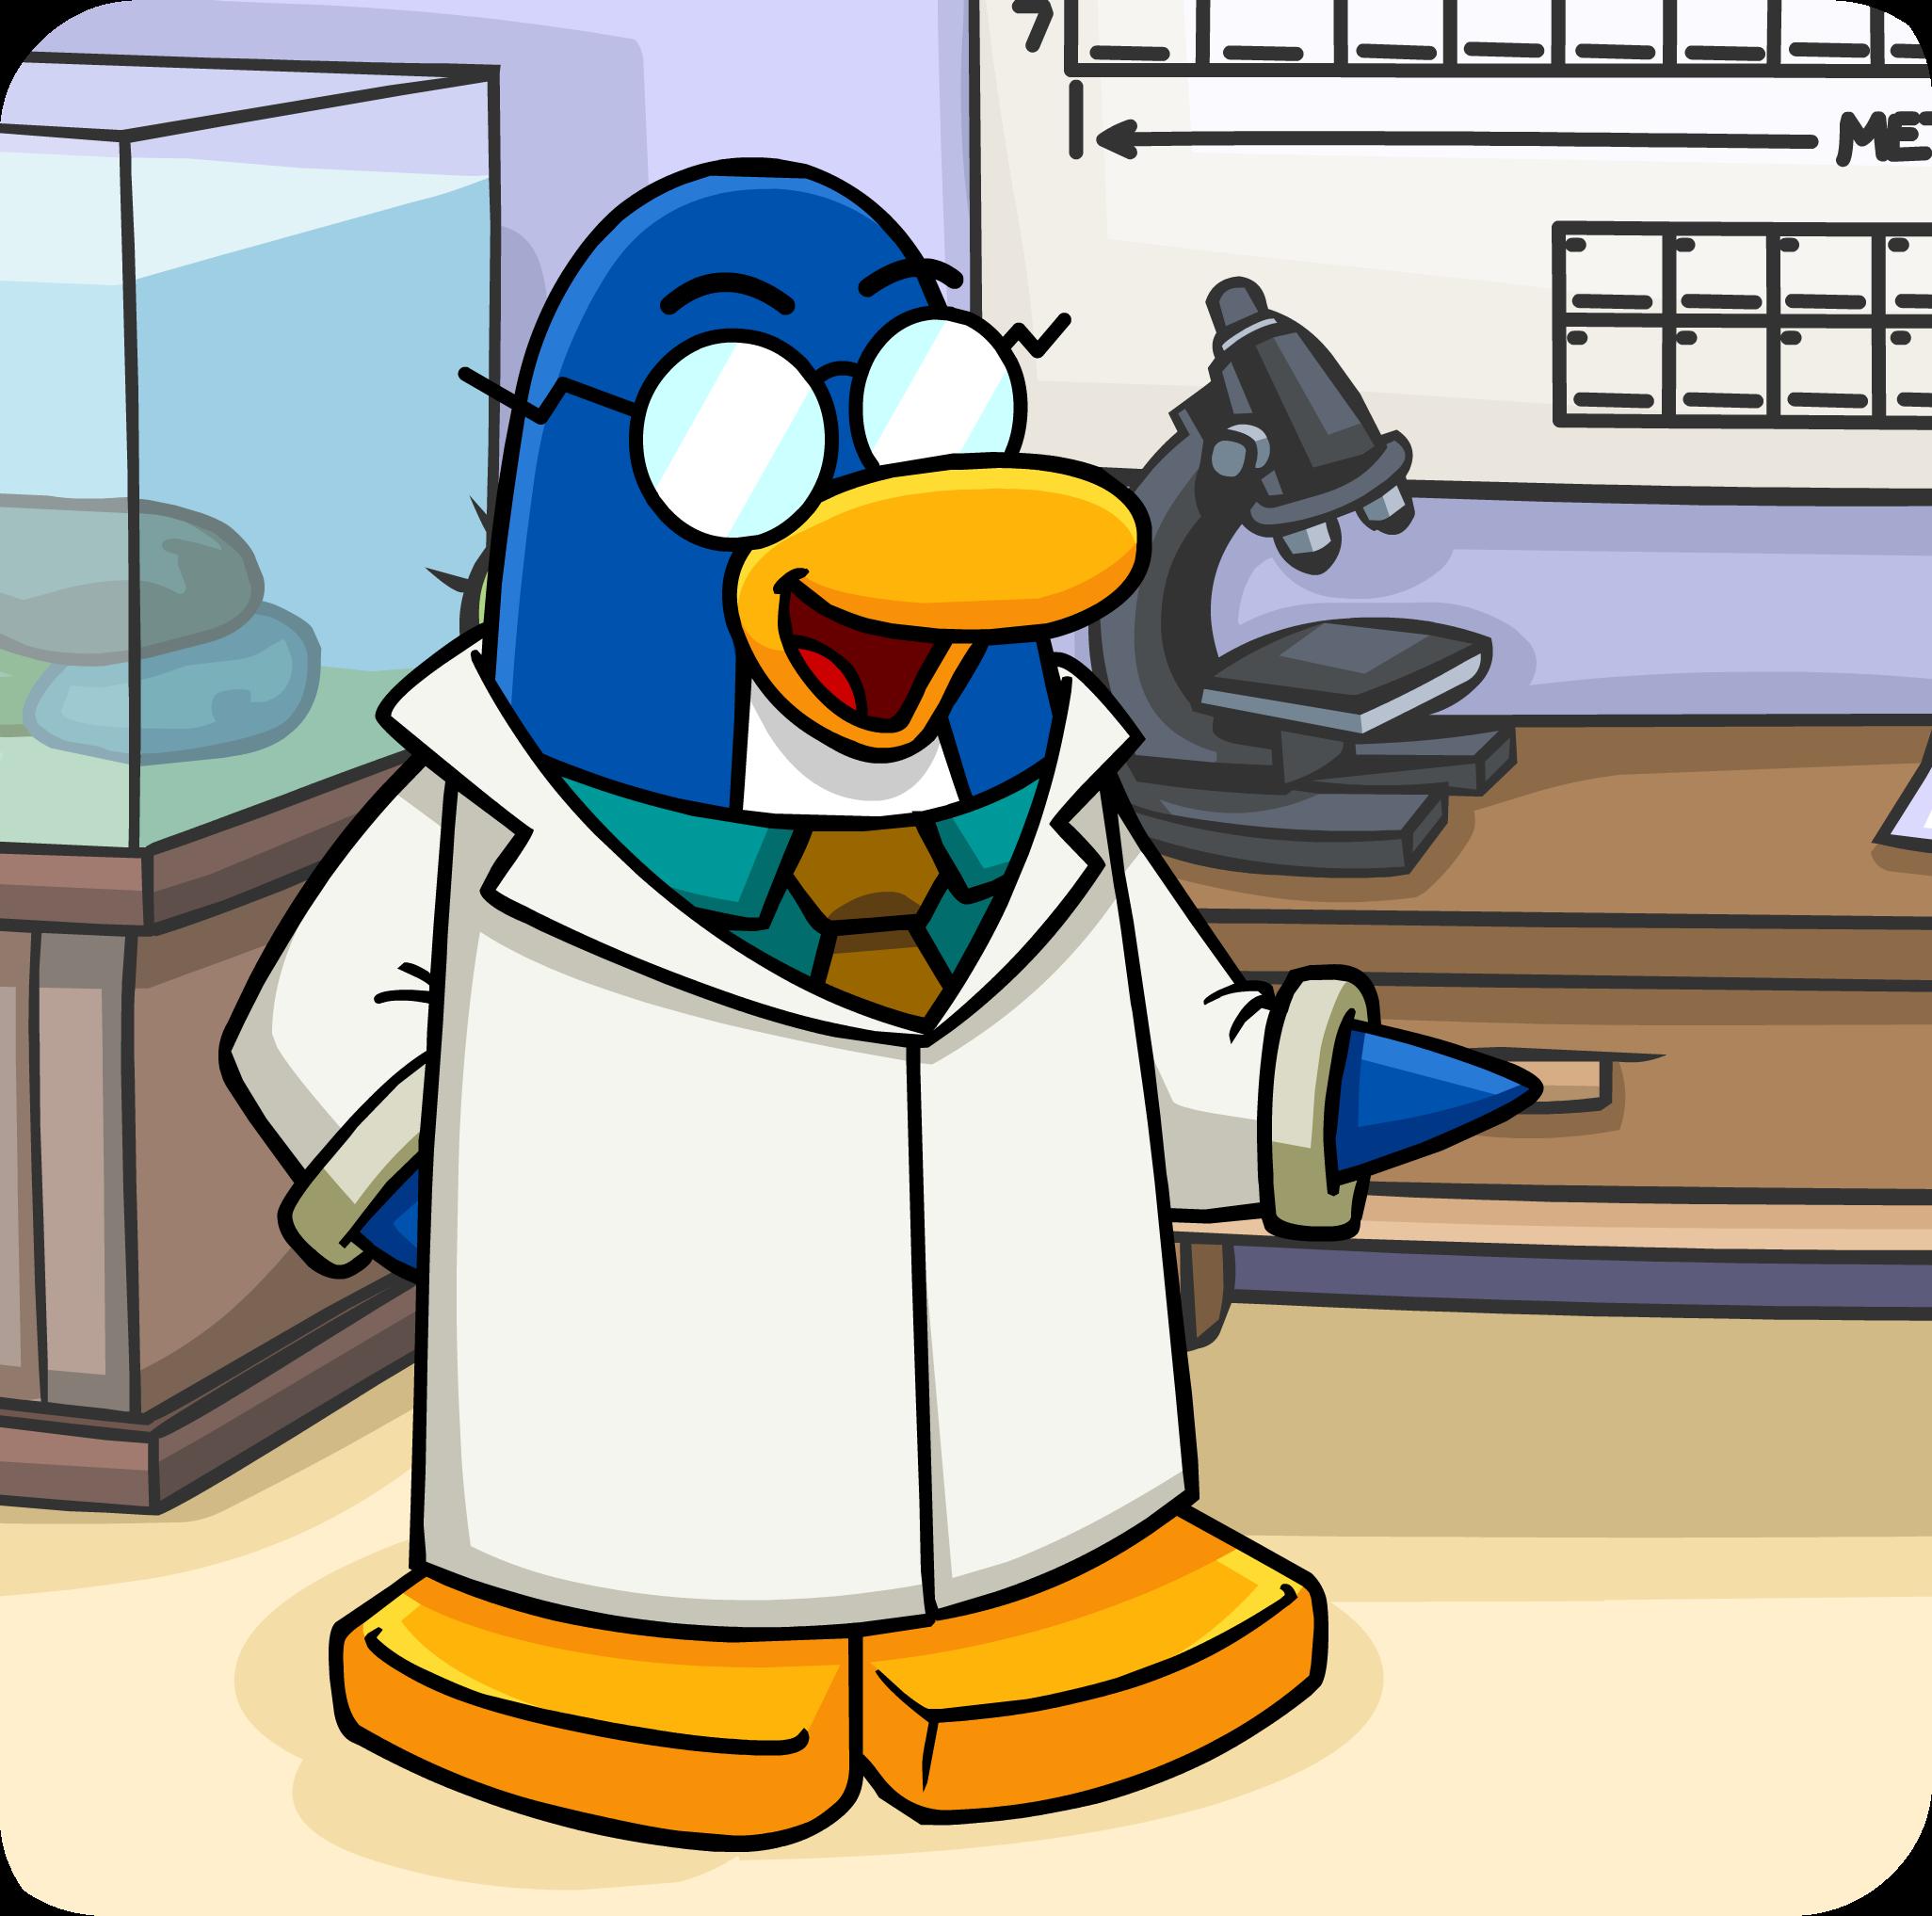 Gary's Glasses (ID 115)